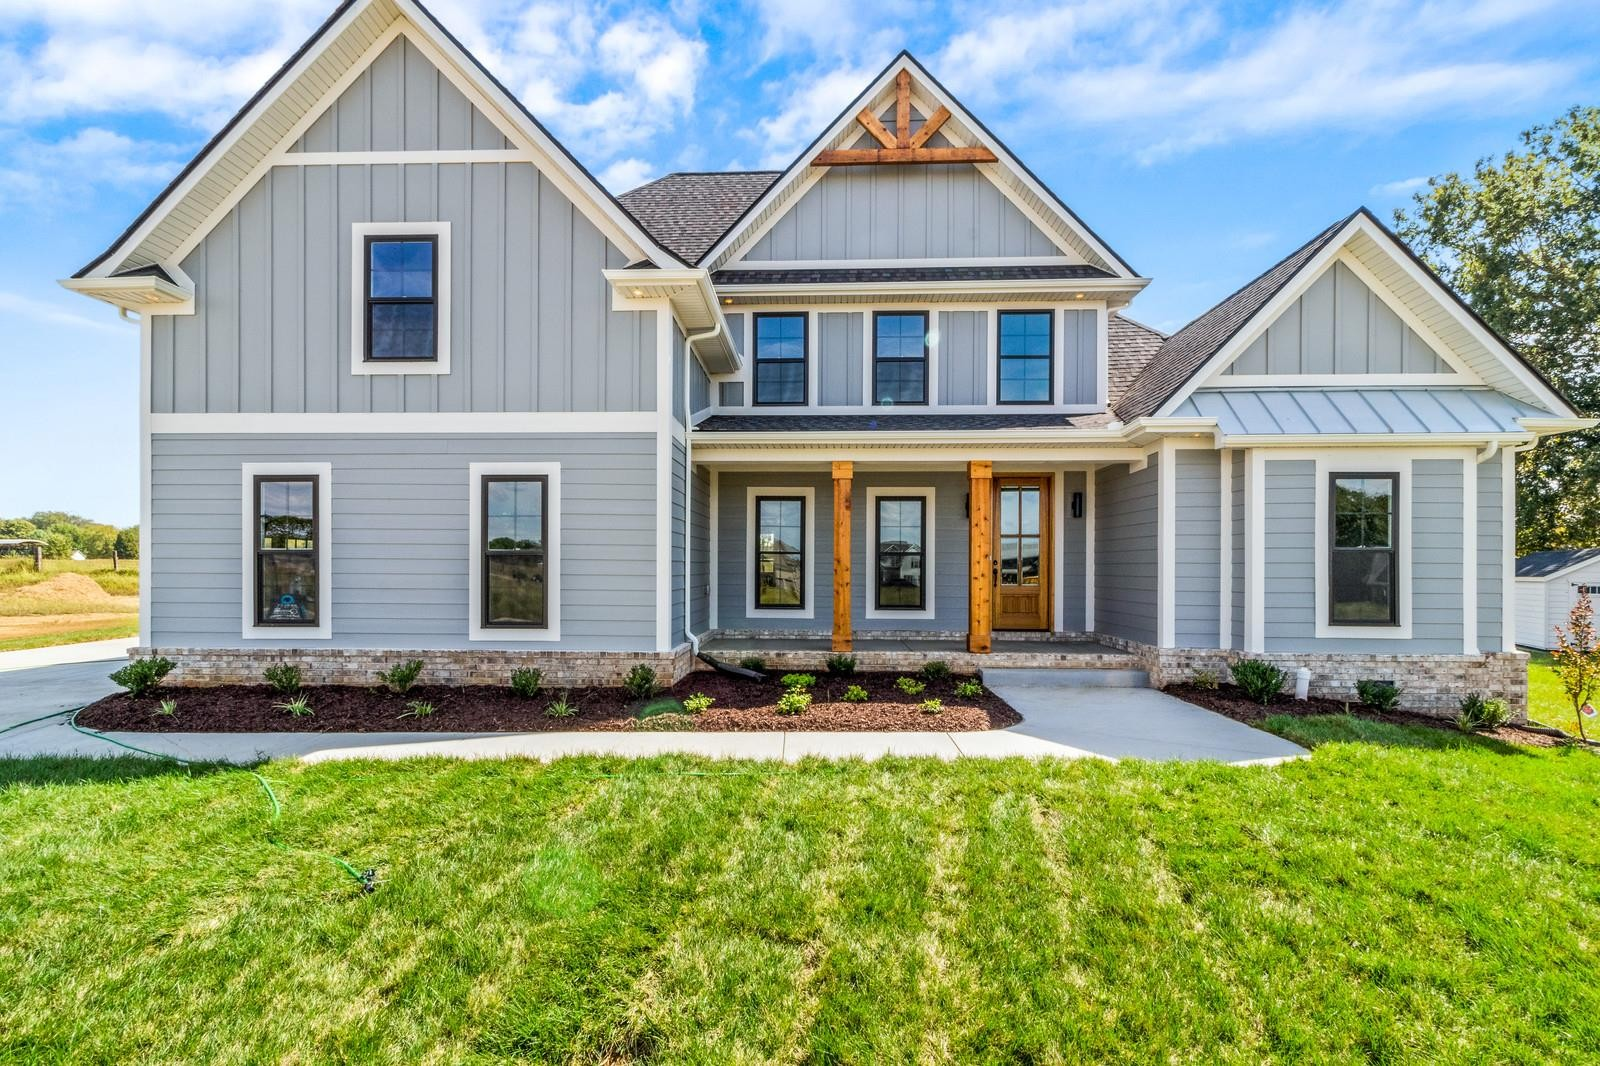 336 Ellington Dr Property Photo - Clarksville, TN real estate listing